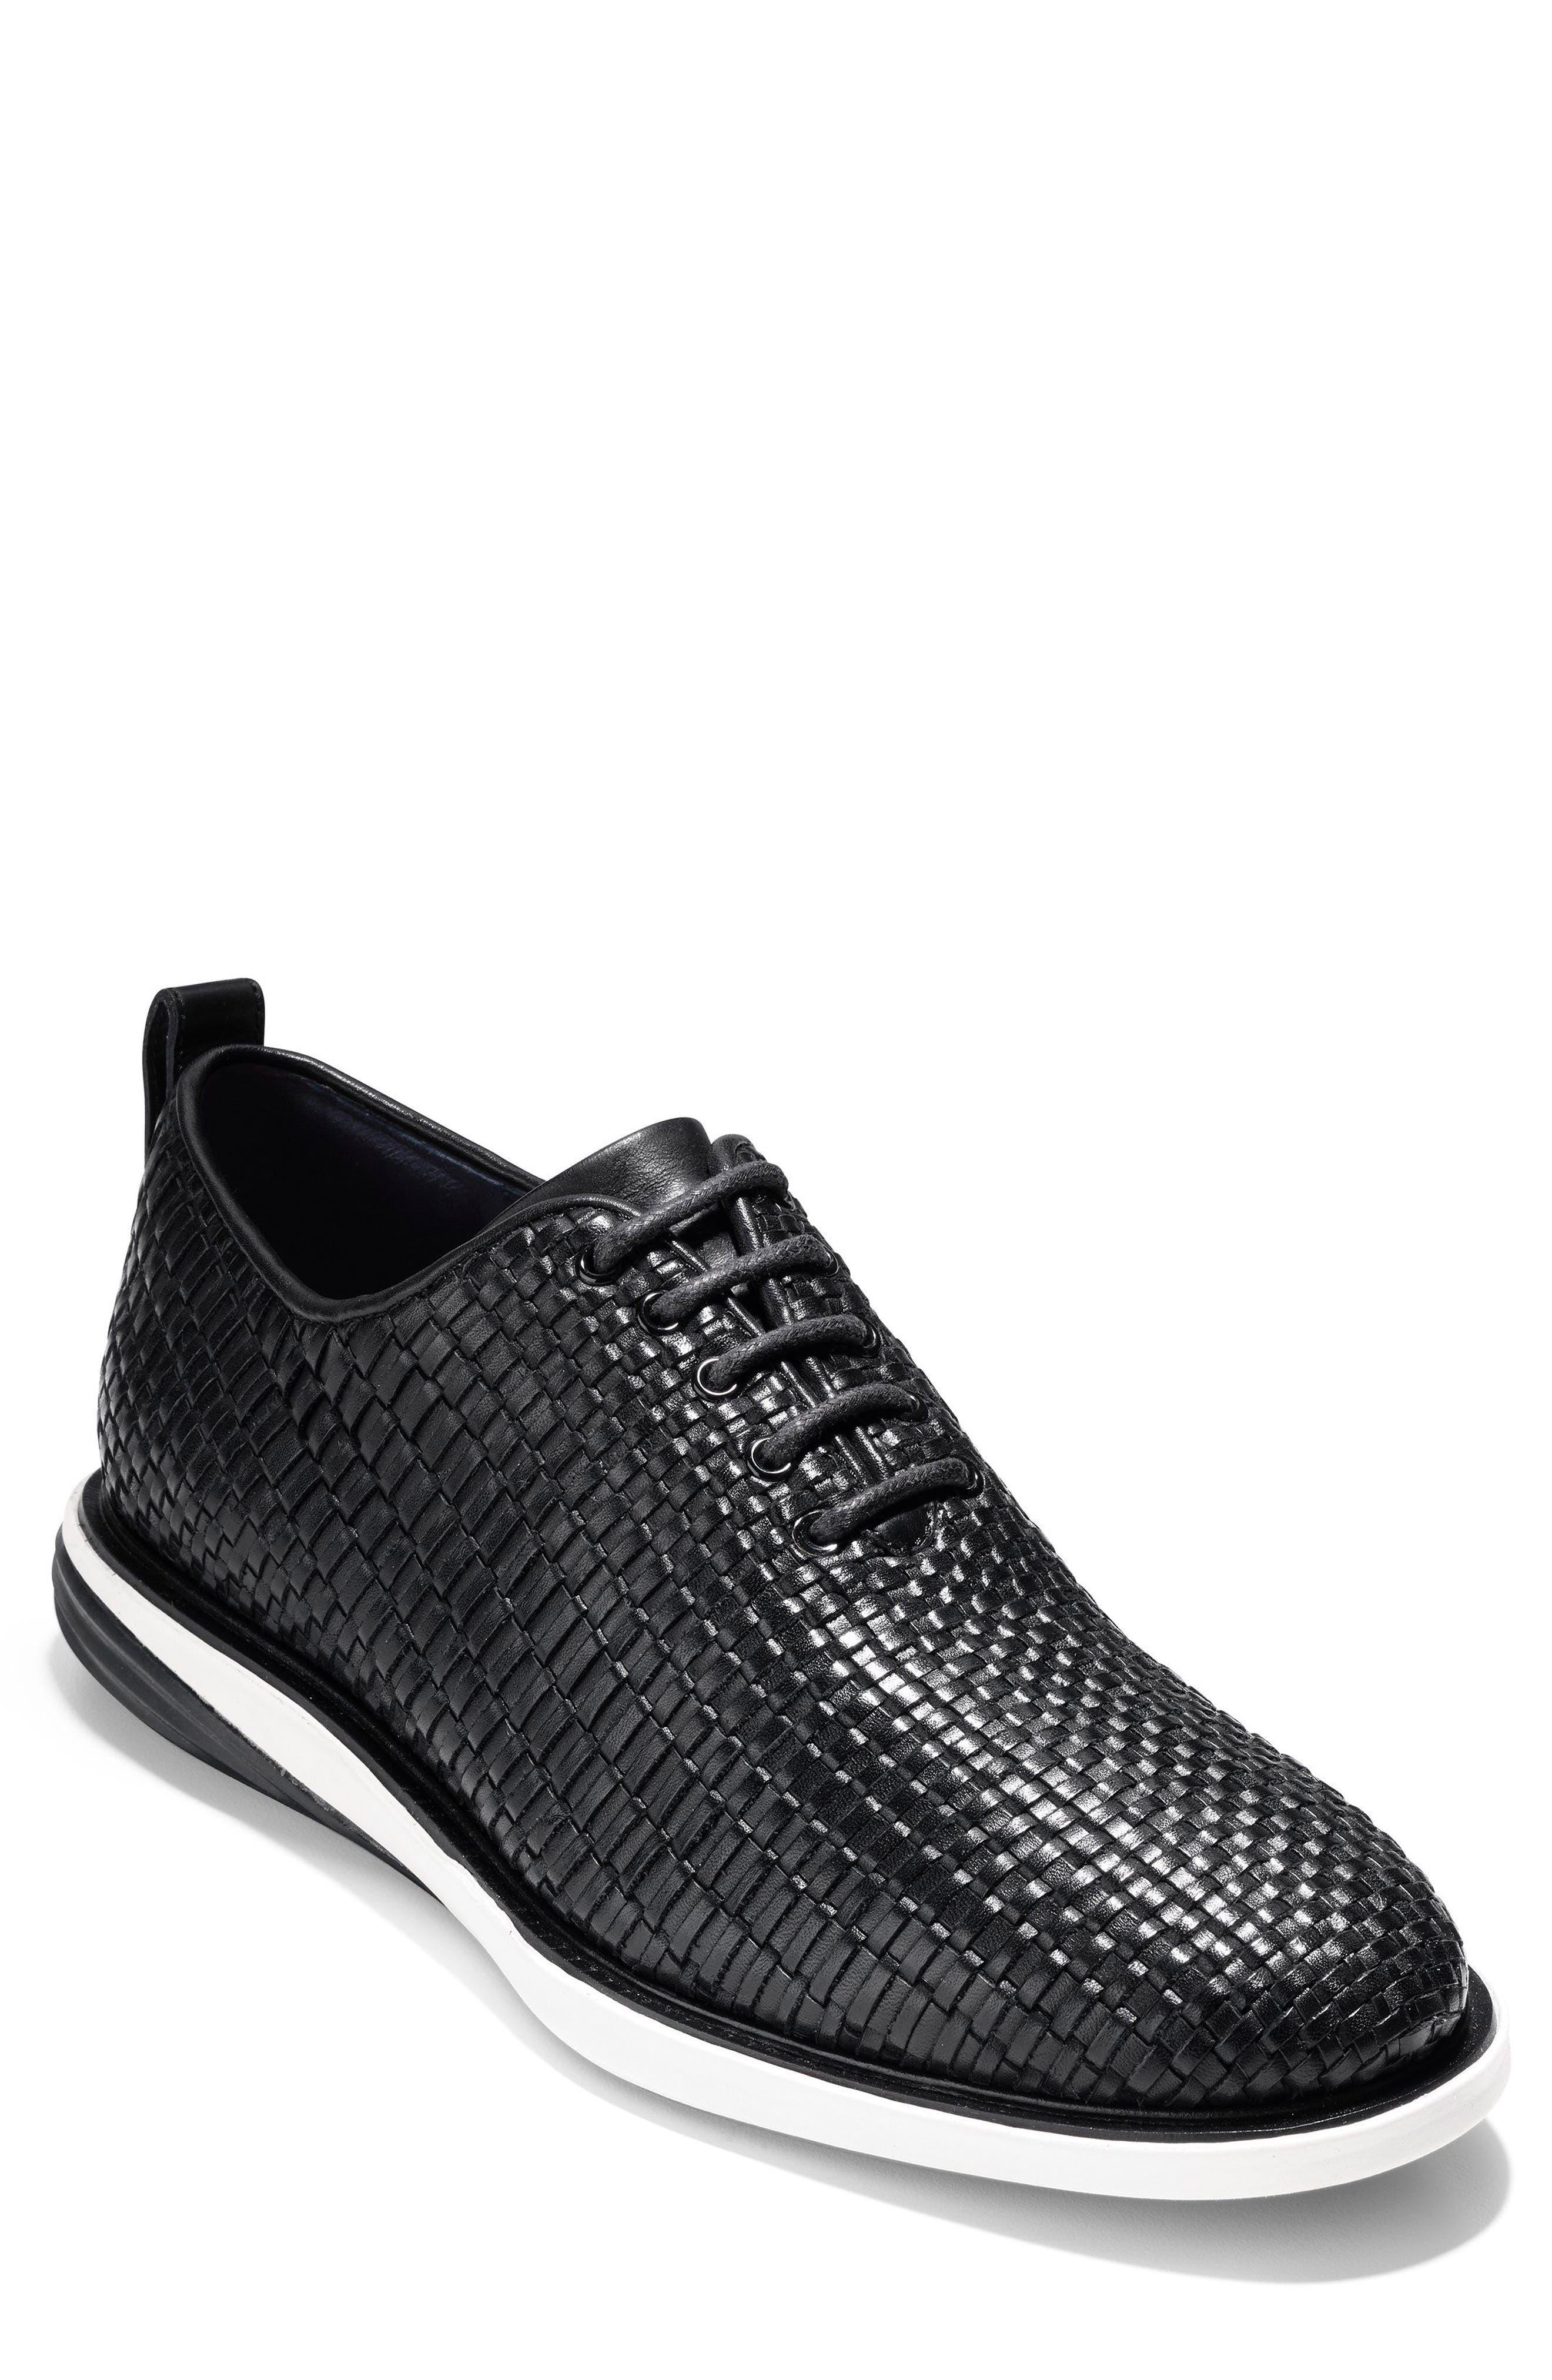 Grand Evolution Woven Oxford,                         Main,                         color, Black Leather